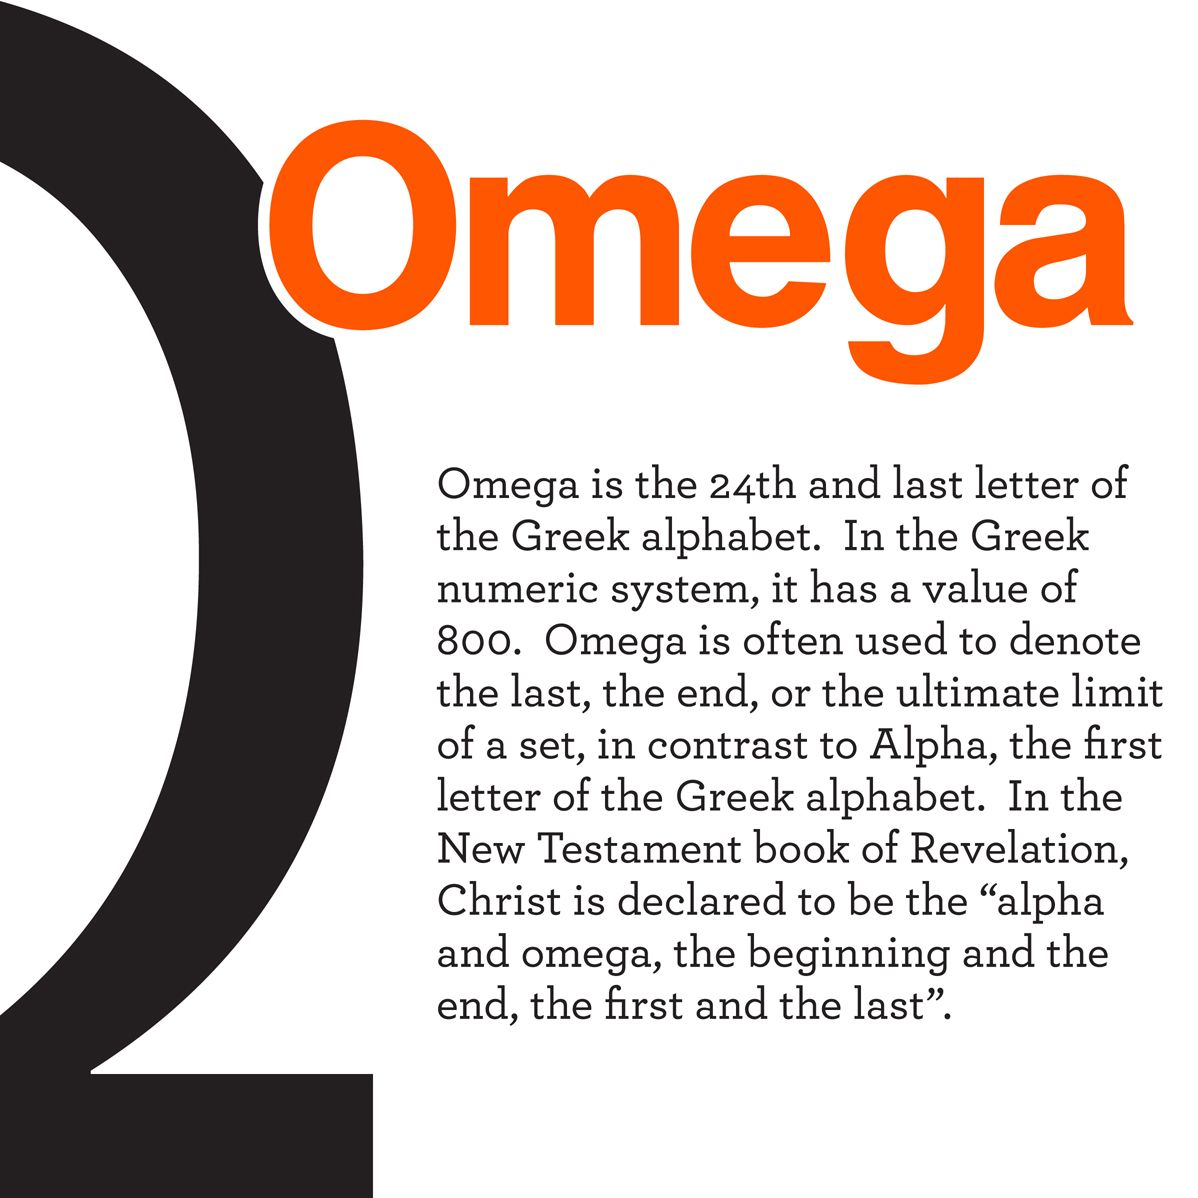 Omega symbols google search omega symbols pinterest omega omega symbols google search biocorpaavc Image collections